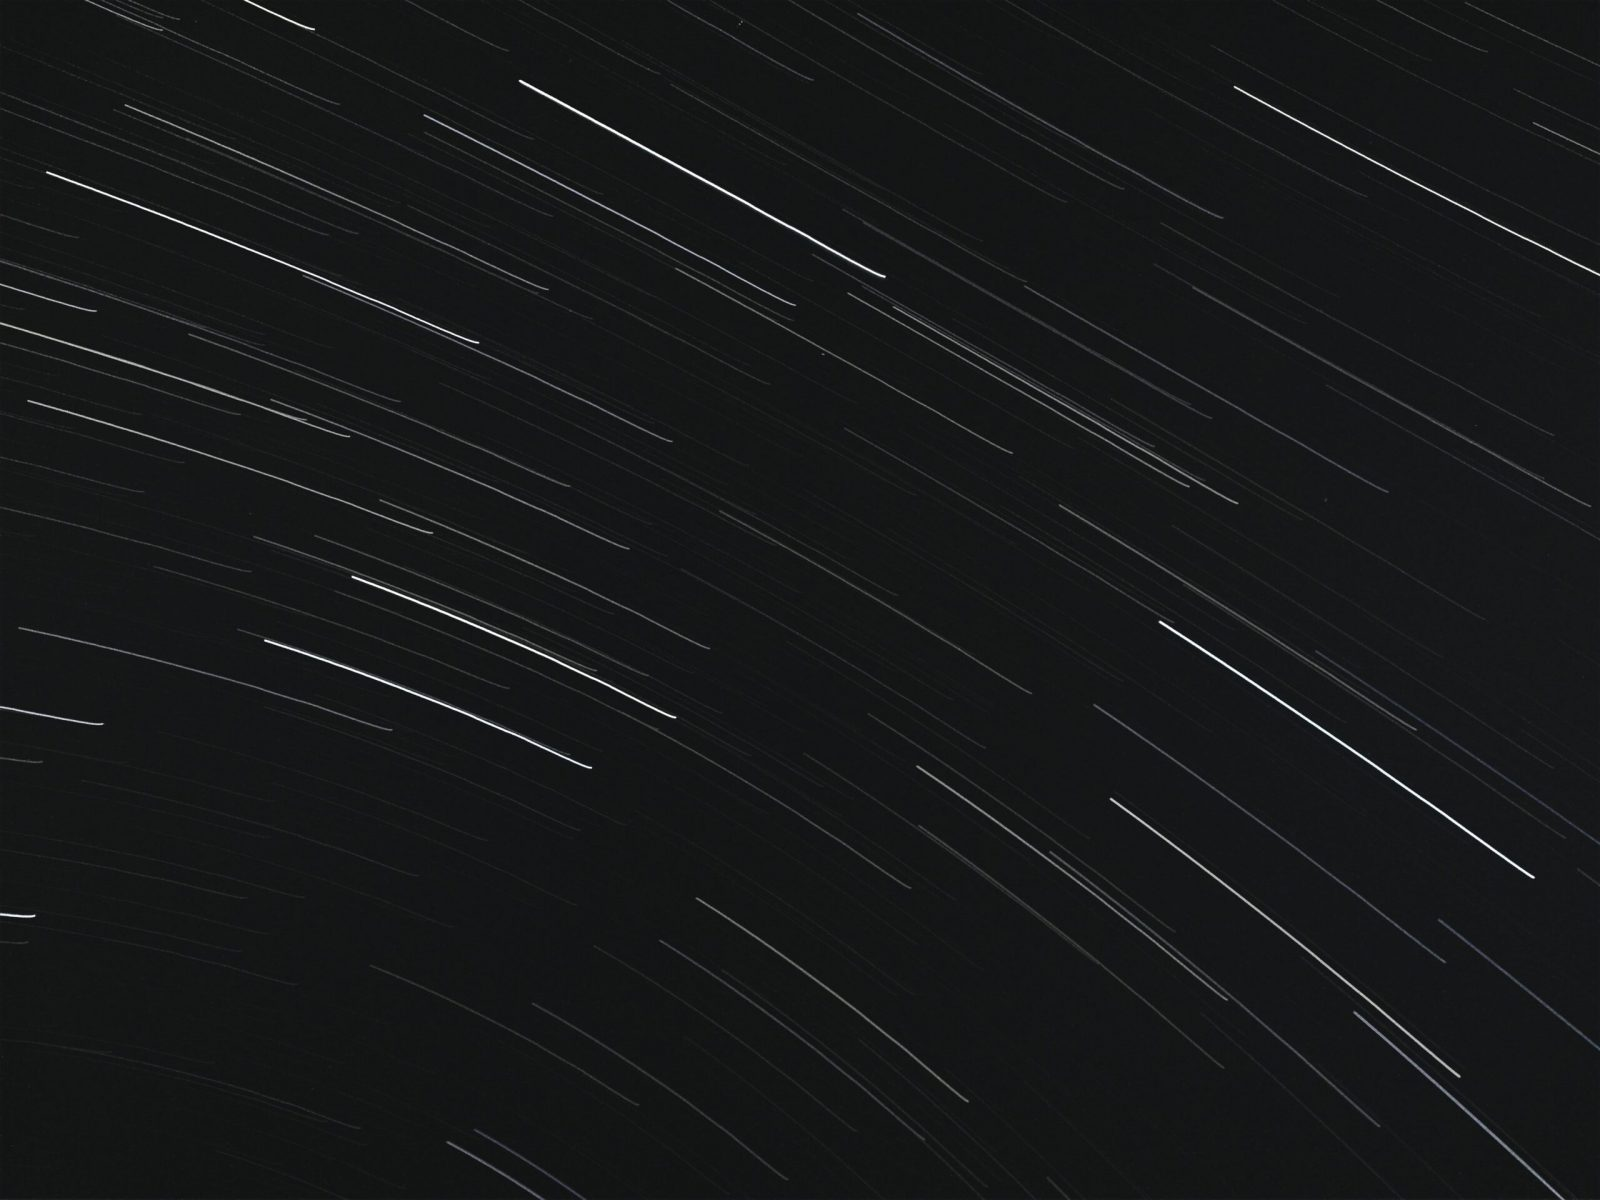 pexels-alex-conchillos-3745234